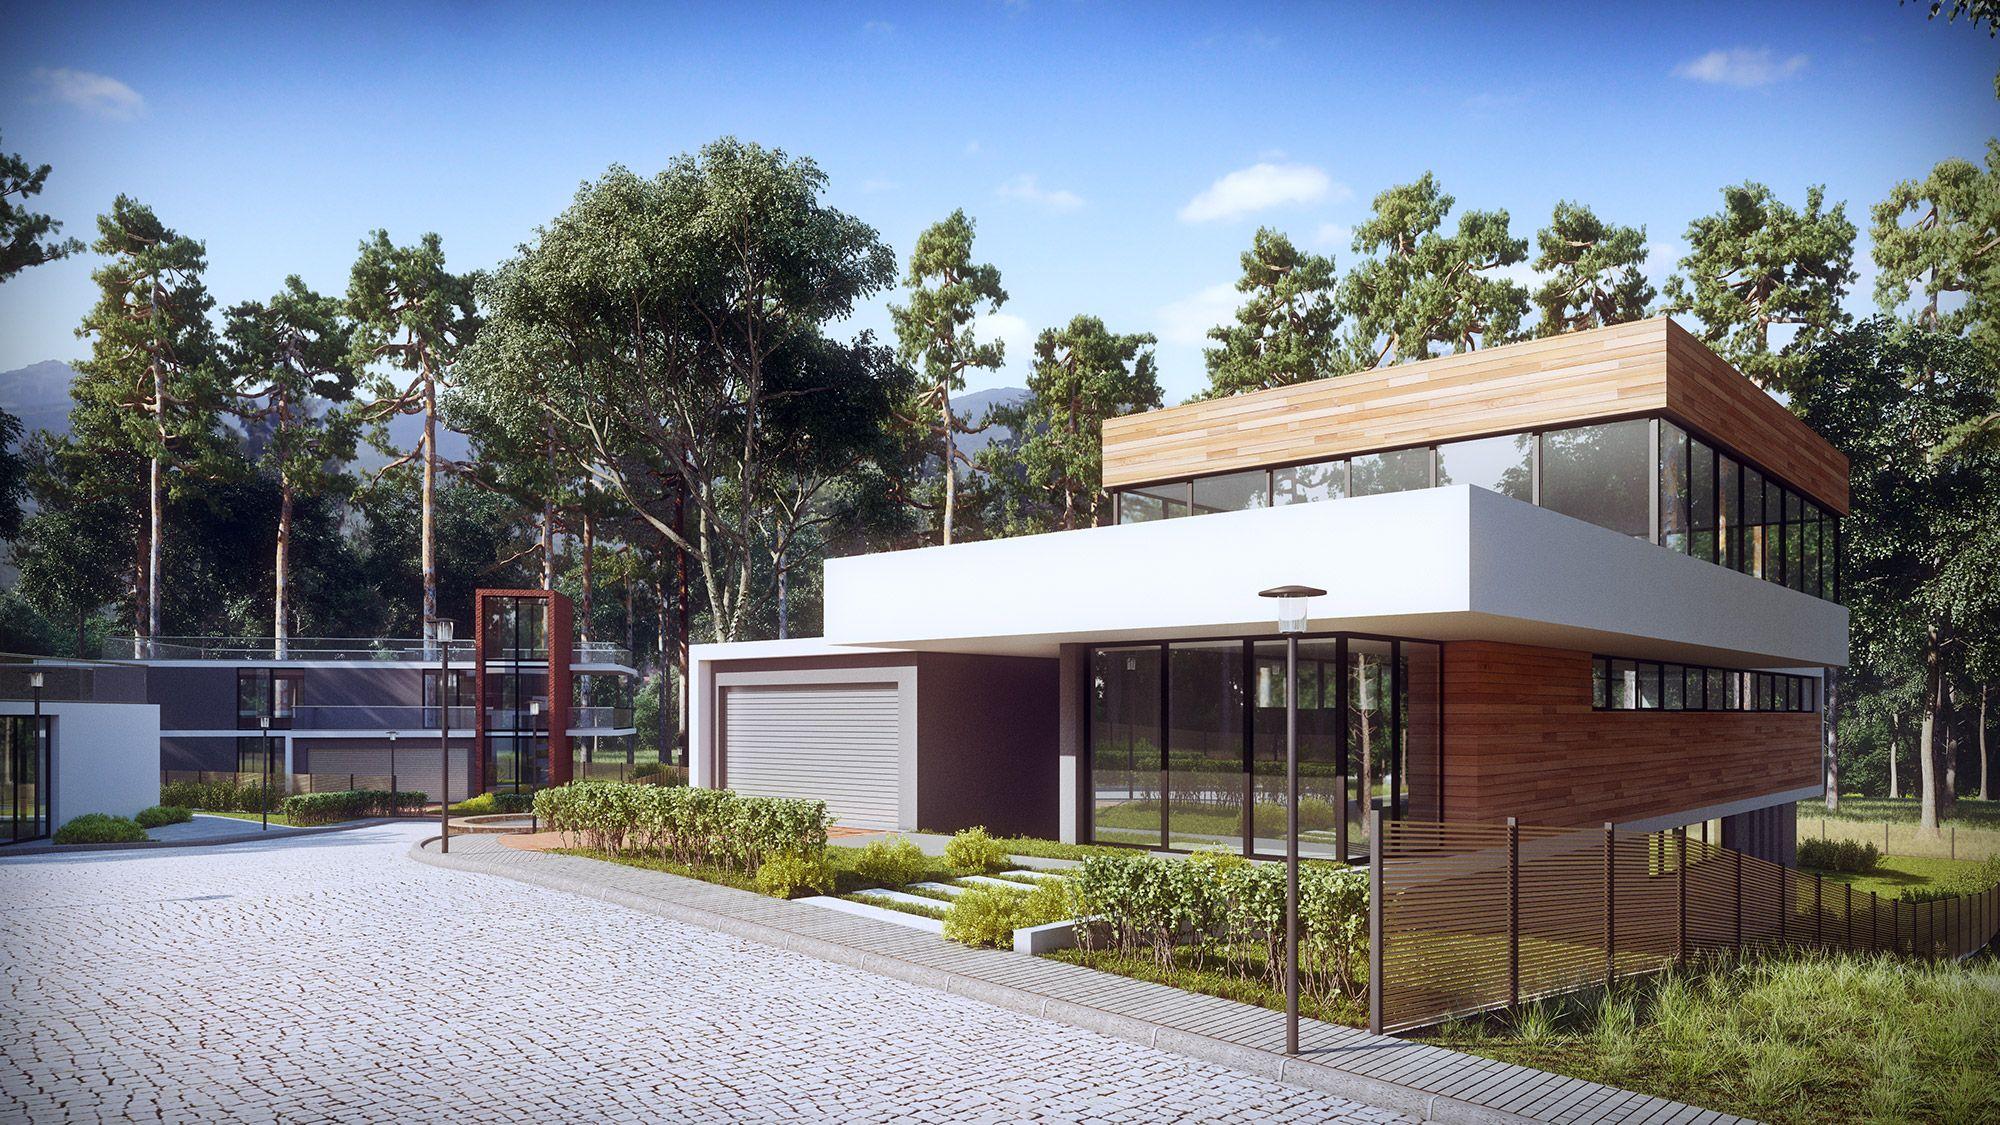 Housing Development Boyana Sofia Kunchevarchdesign CG